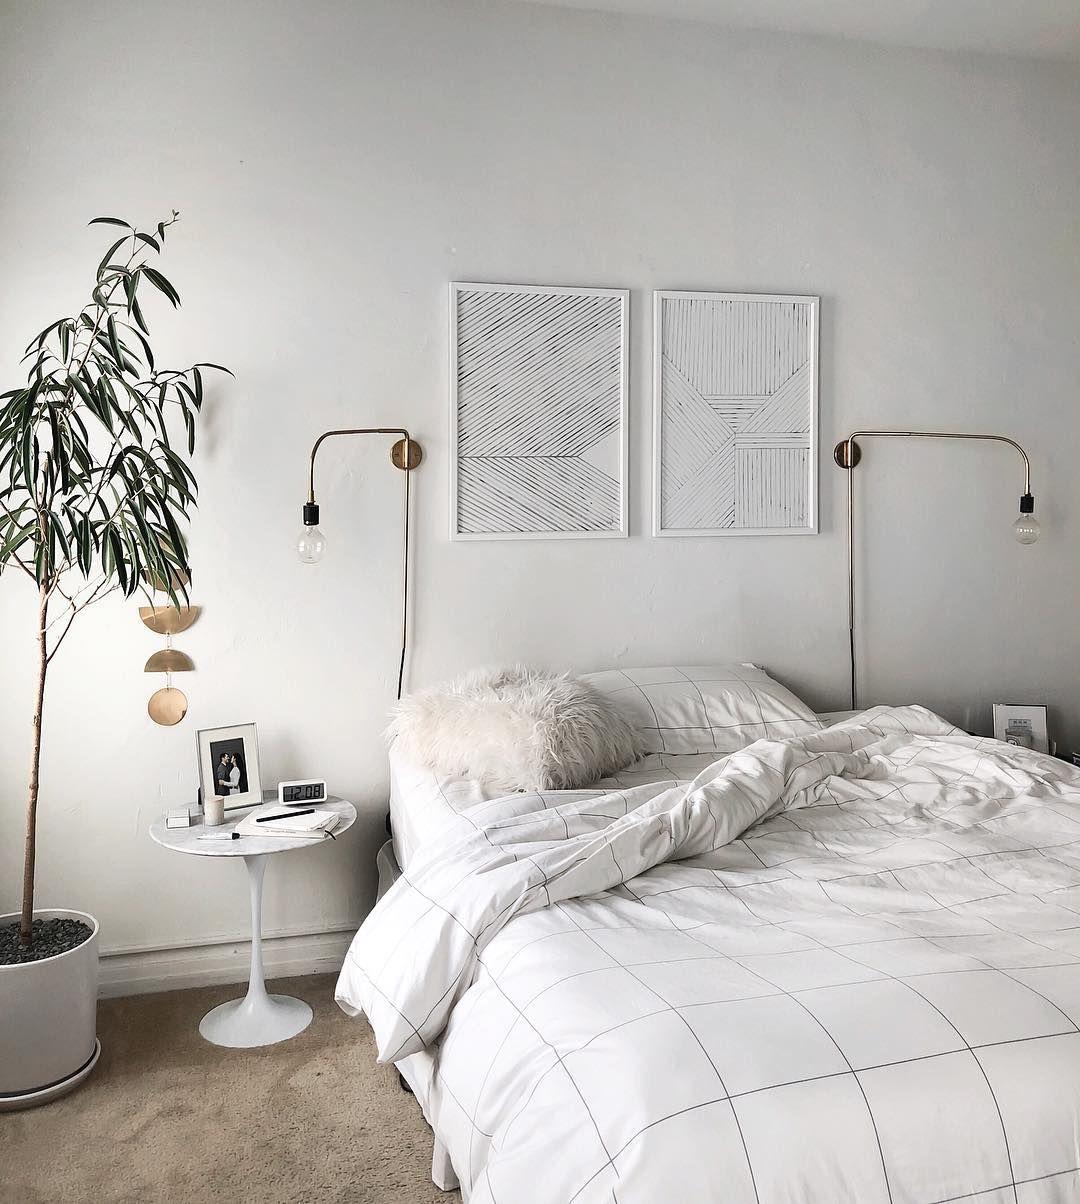 Master Bedroom Design Inspiration Neutral Palette With Brass Decor Minimalist Scandinavian Style Inredning